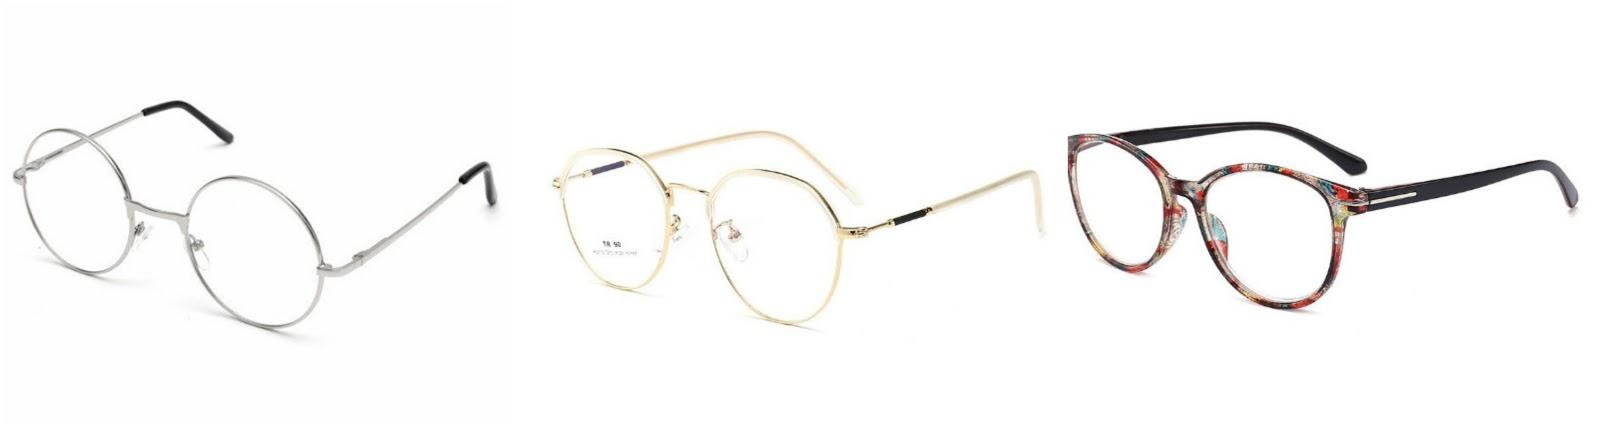 circle lens glasses harry potter style